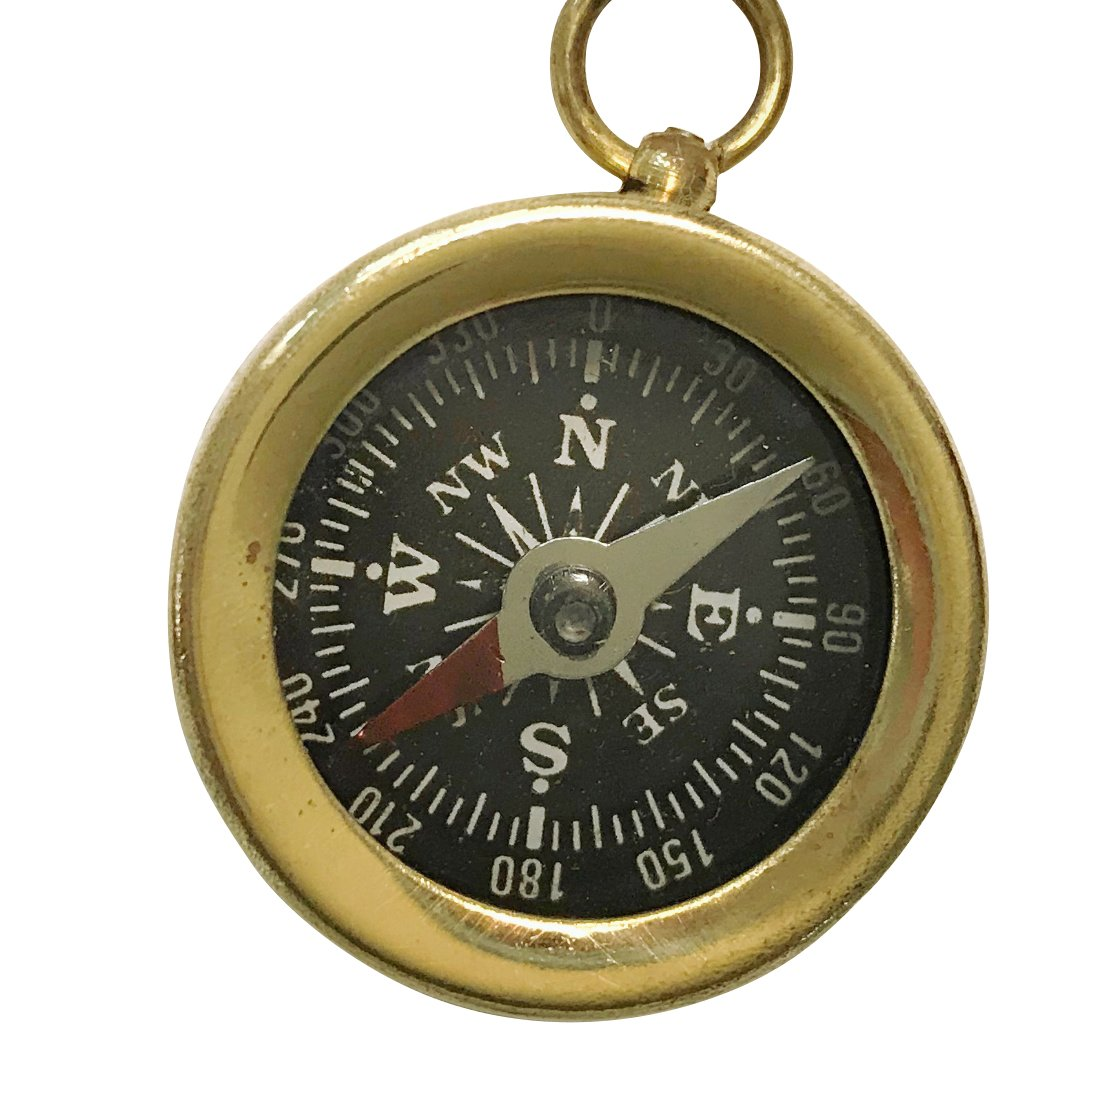 UMBRELLALABORATORY Steampunk Antique Nautical Necklace Compass